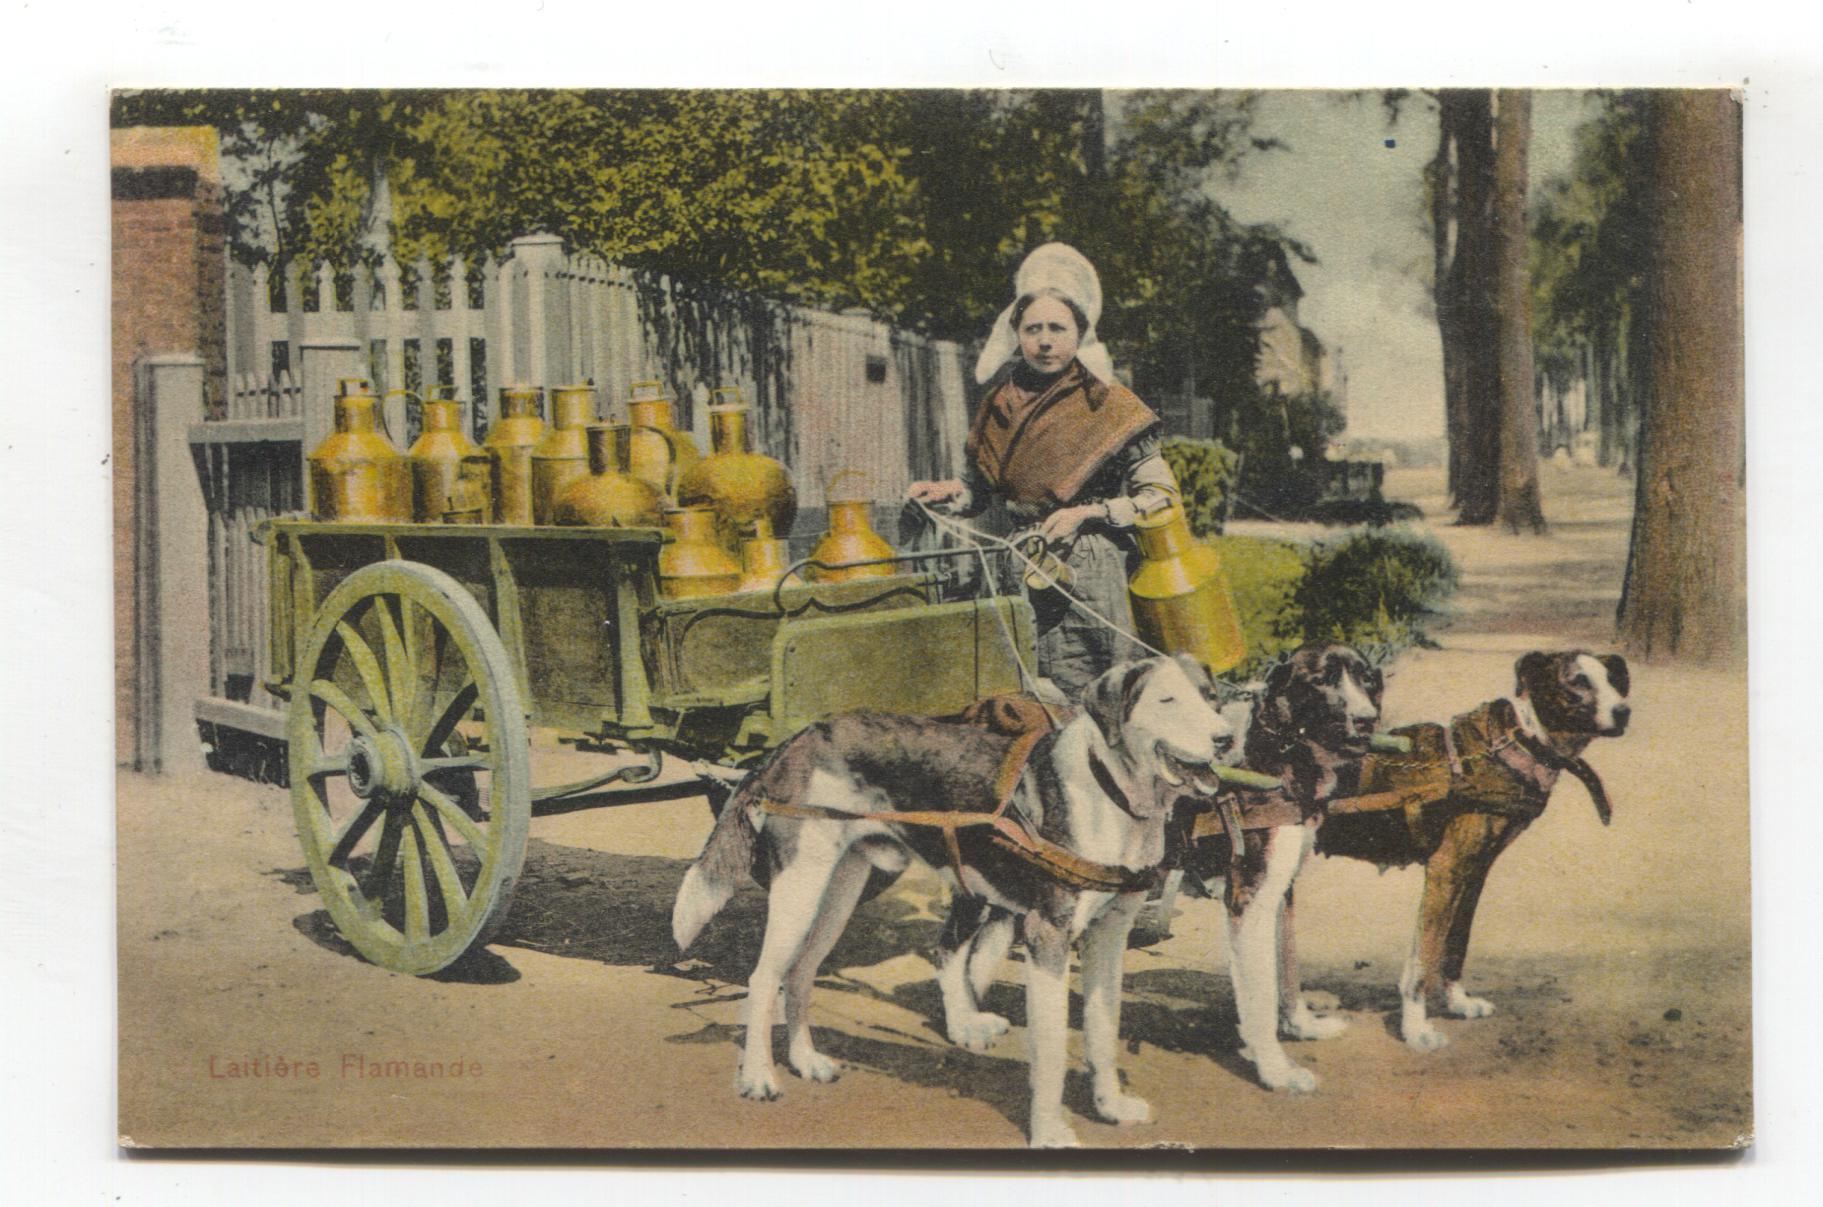 Laitiere Flamande - dairy dog cart & woman - 1908 used Belgium postcard